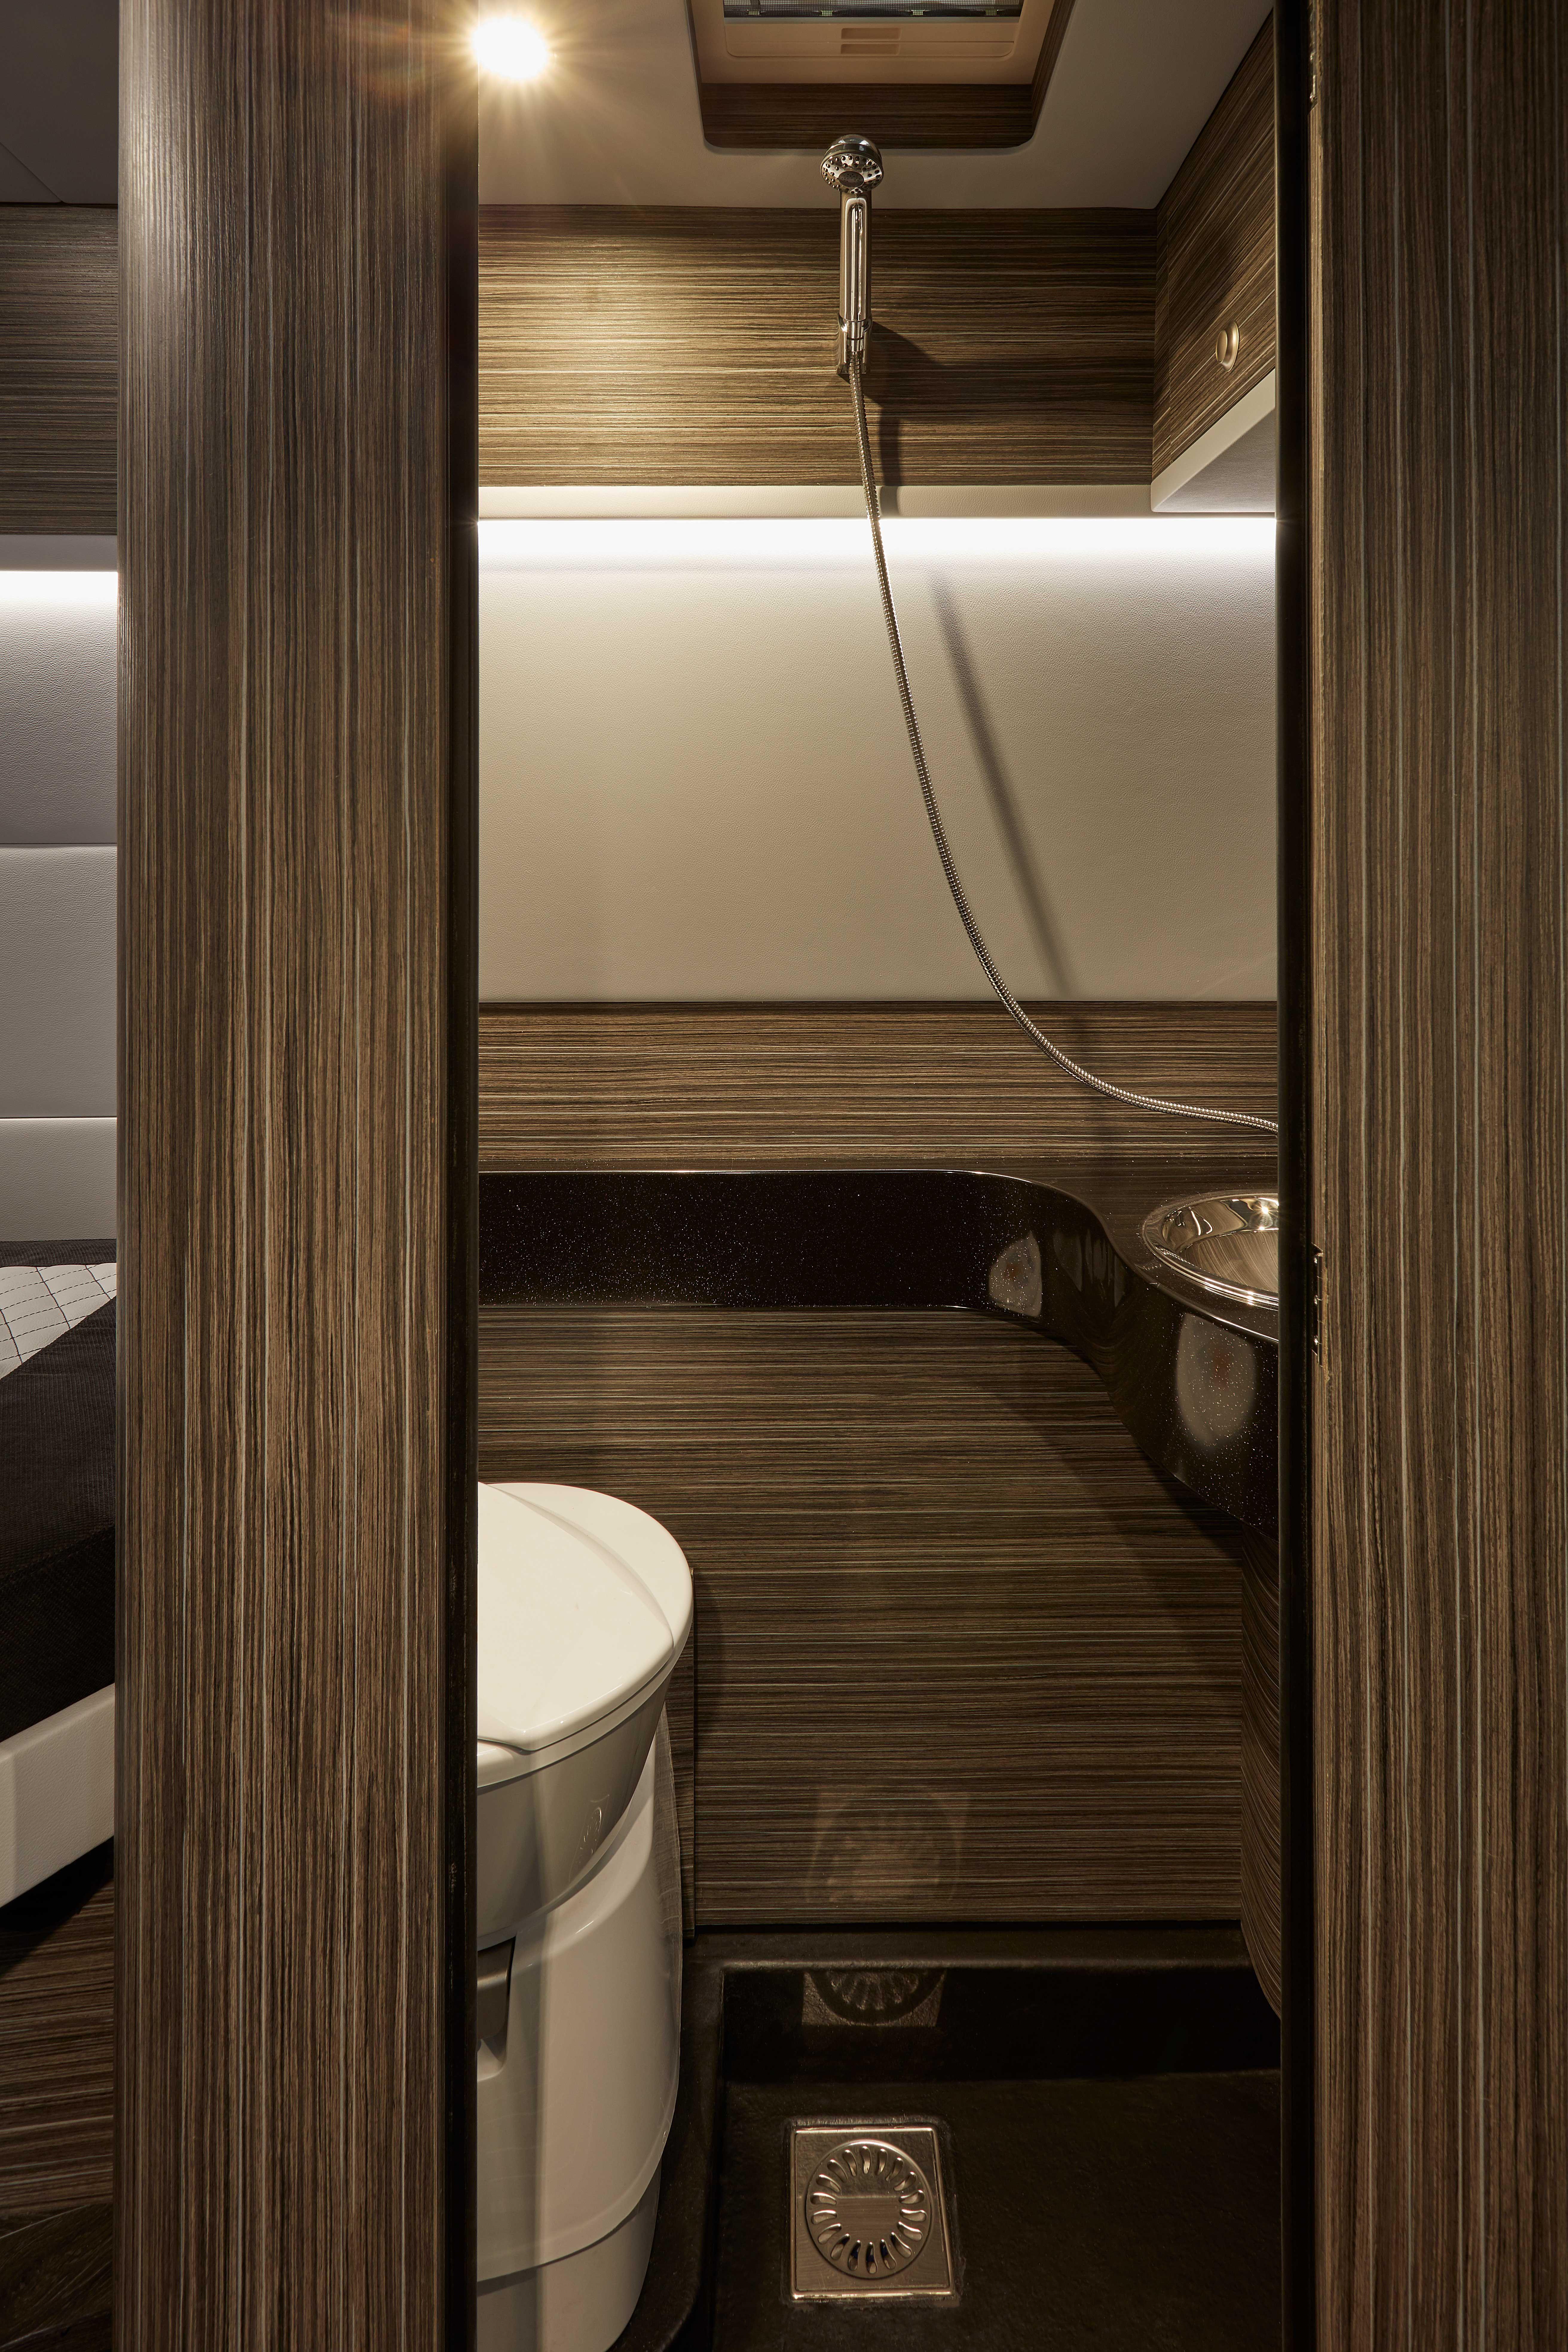 Campervans, Sprinter, Bathroom, Shower, Dark Interior   Motorcycle camping, Luxury rv ...